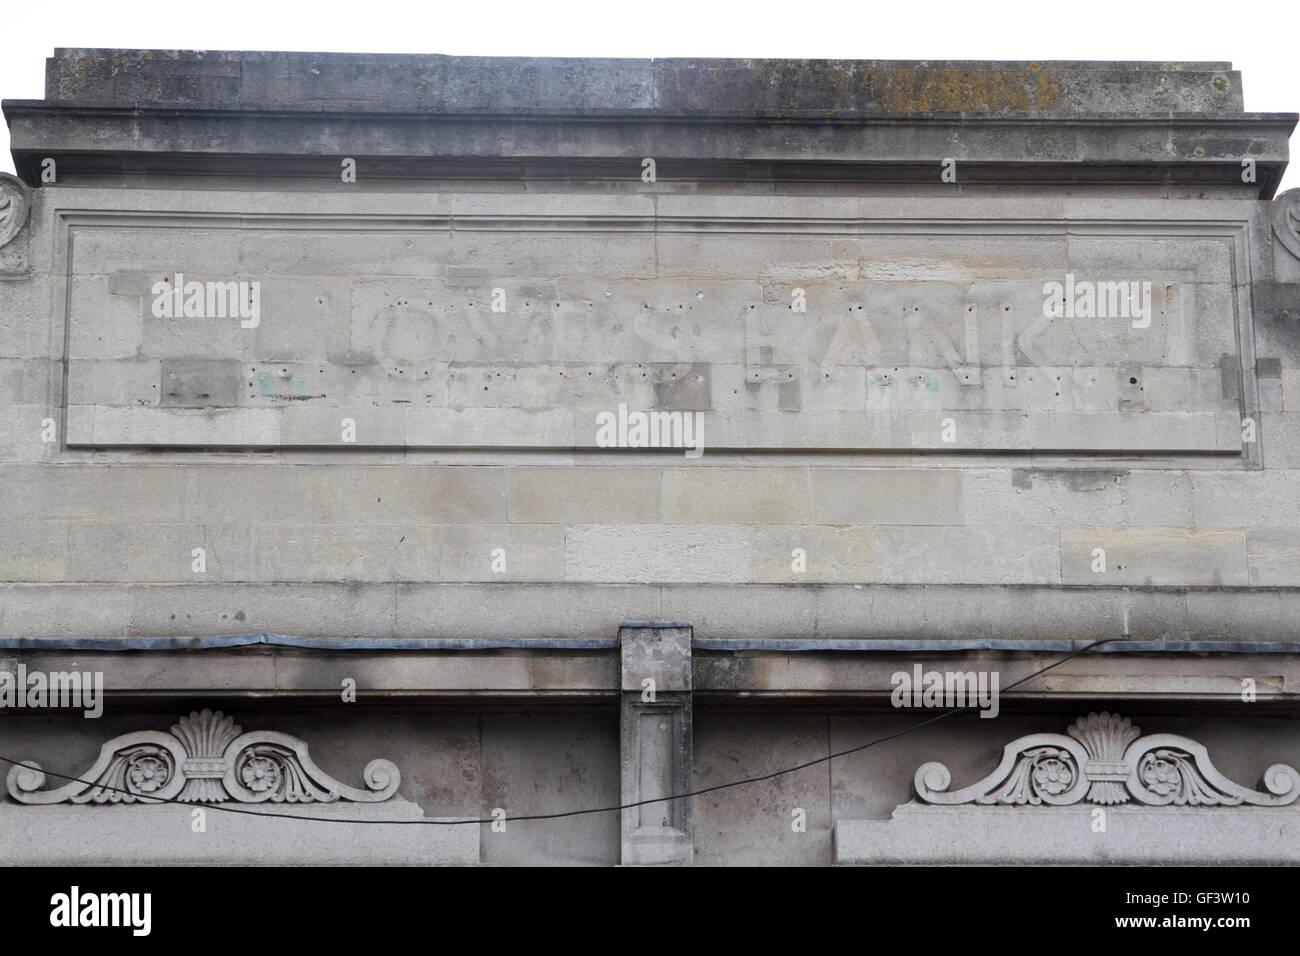 Wimbledon London, UK 28th July 2016. Lloyds bank signage of closed branch in Wimbledon High Street. Lloyds banking - Stock Image